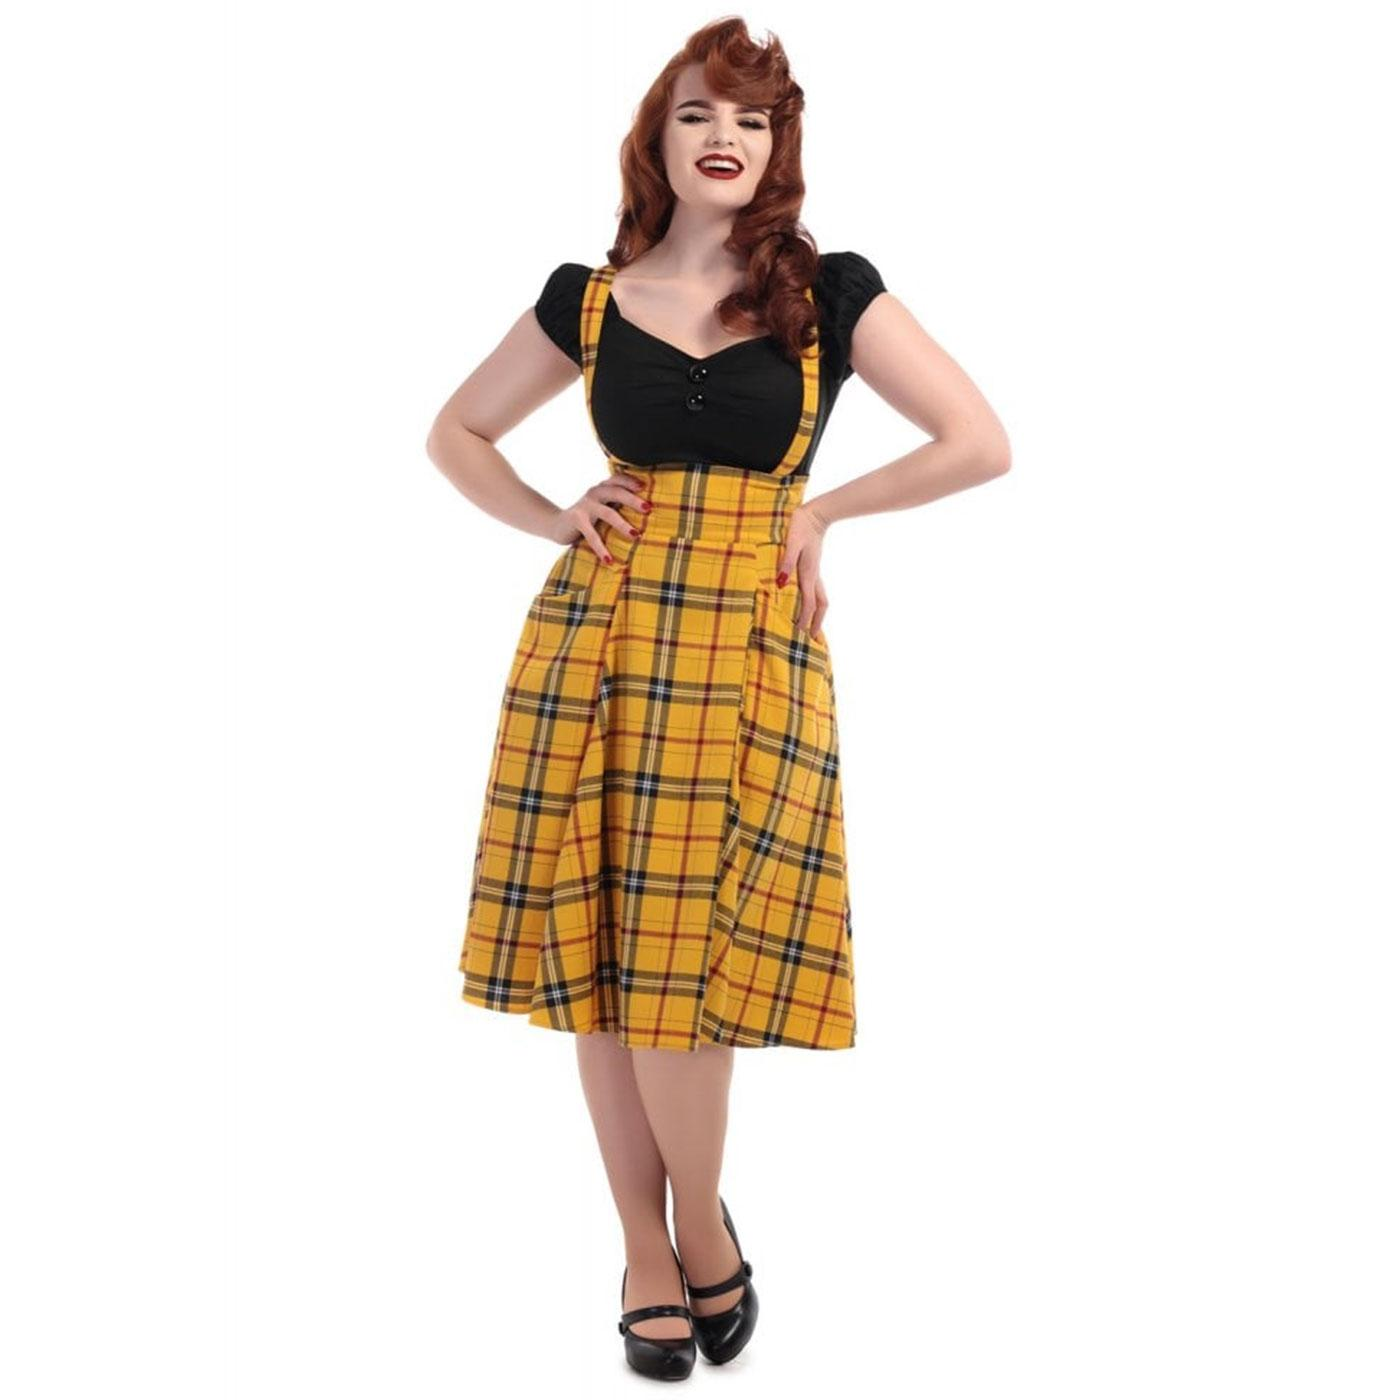 Alexa COLLECTIF Retro 50s Strap Check Swing Skirt